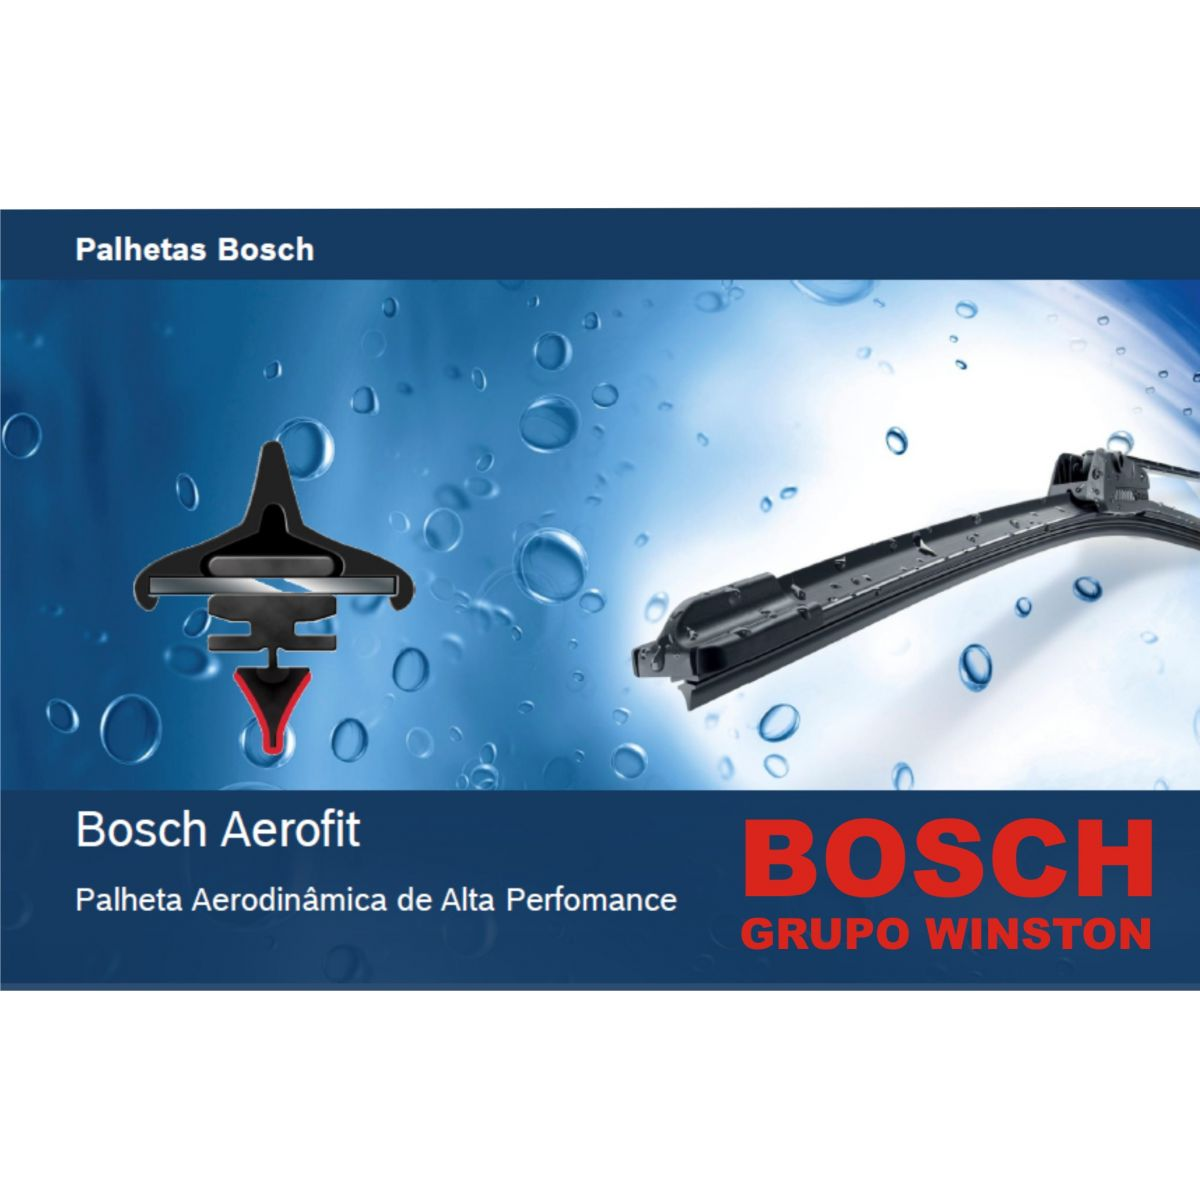 Palheta Bosch Aerofit Limpador de para brisa Bosch JEEP Grand Cherokee / Laredo Patriot